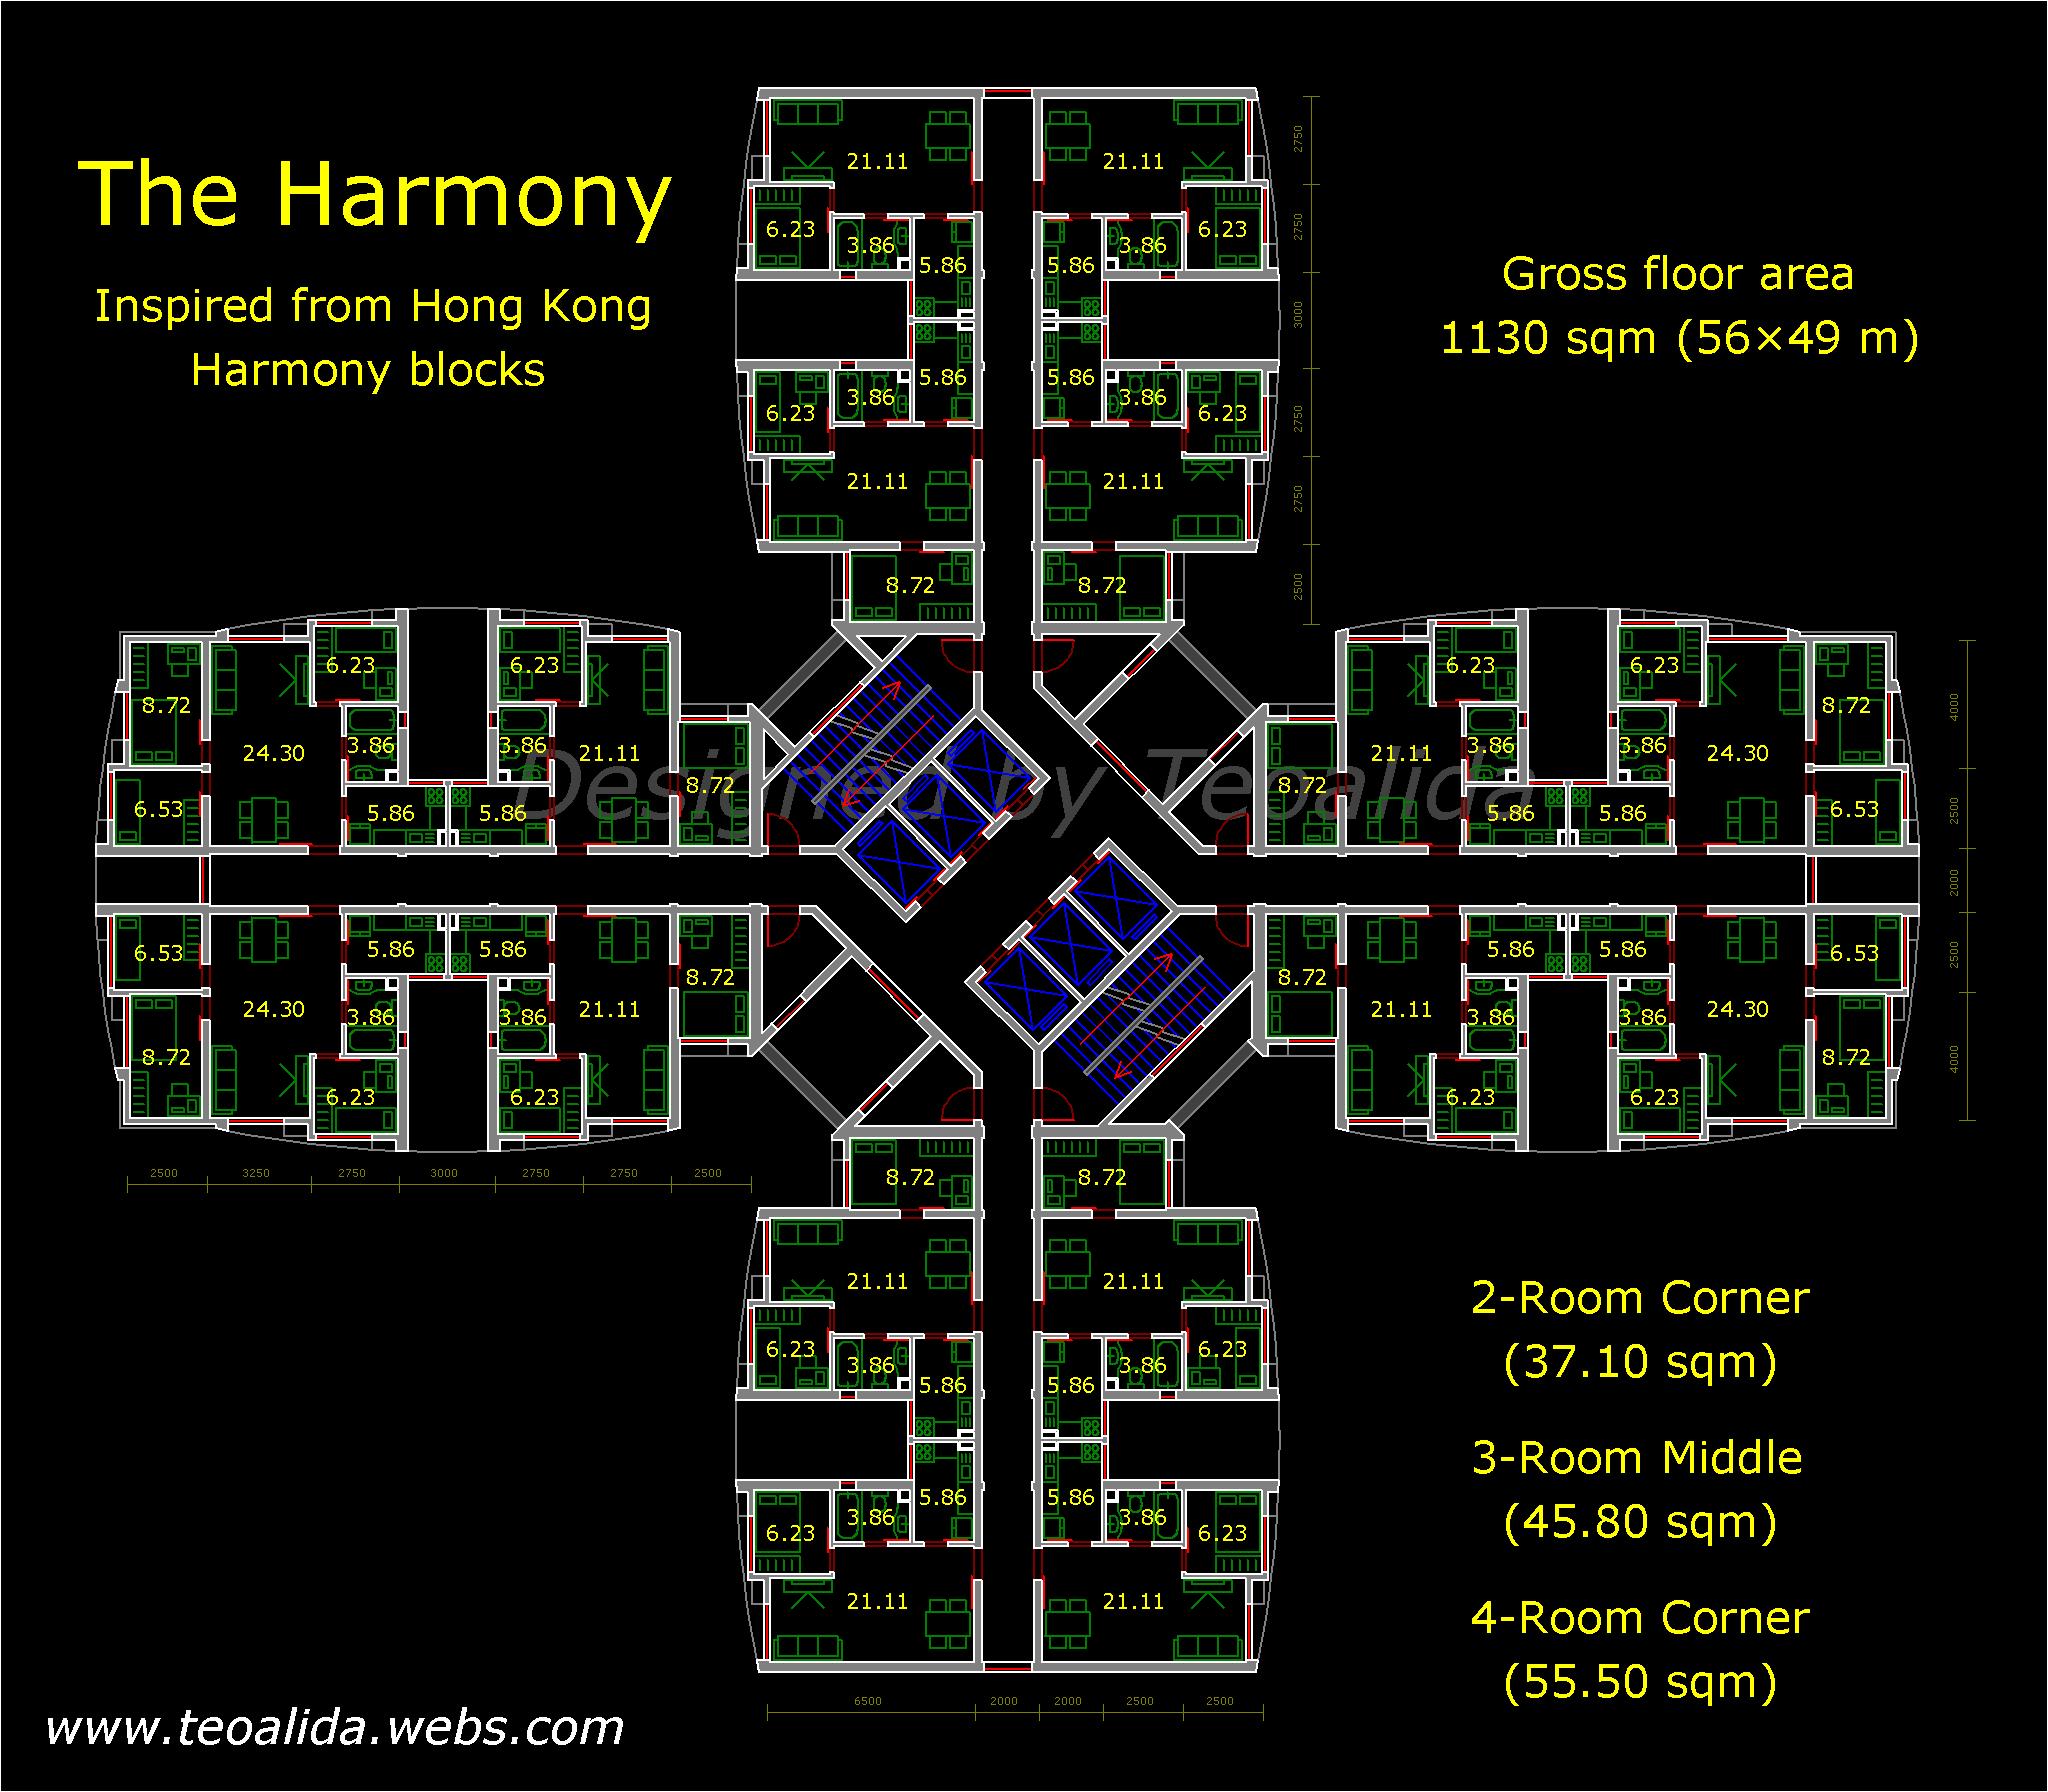 HK Harmony